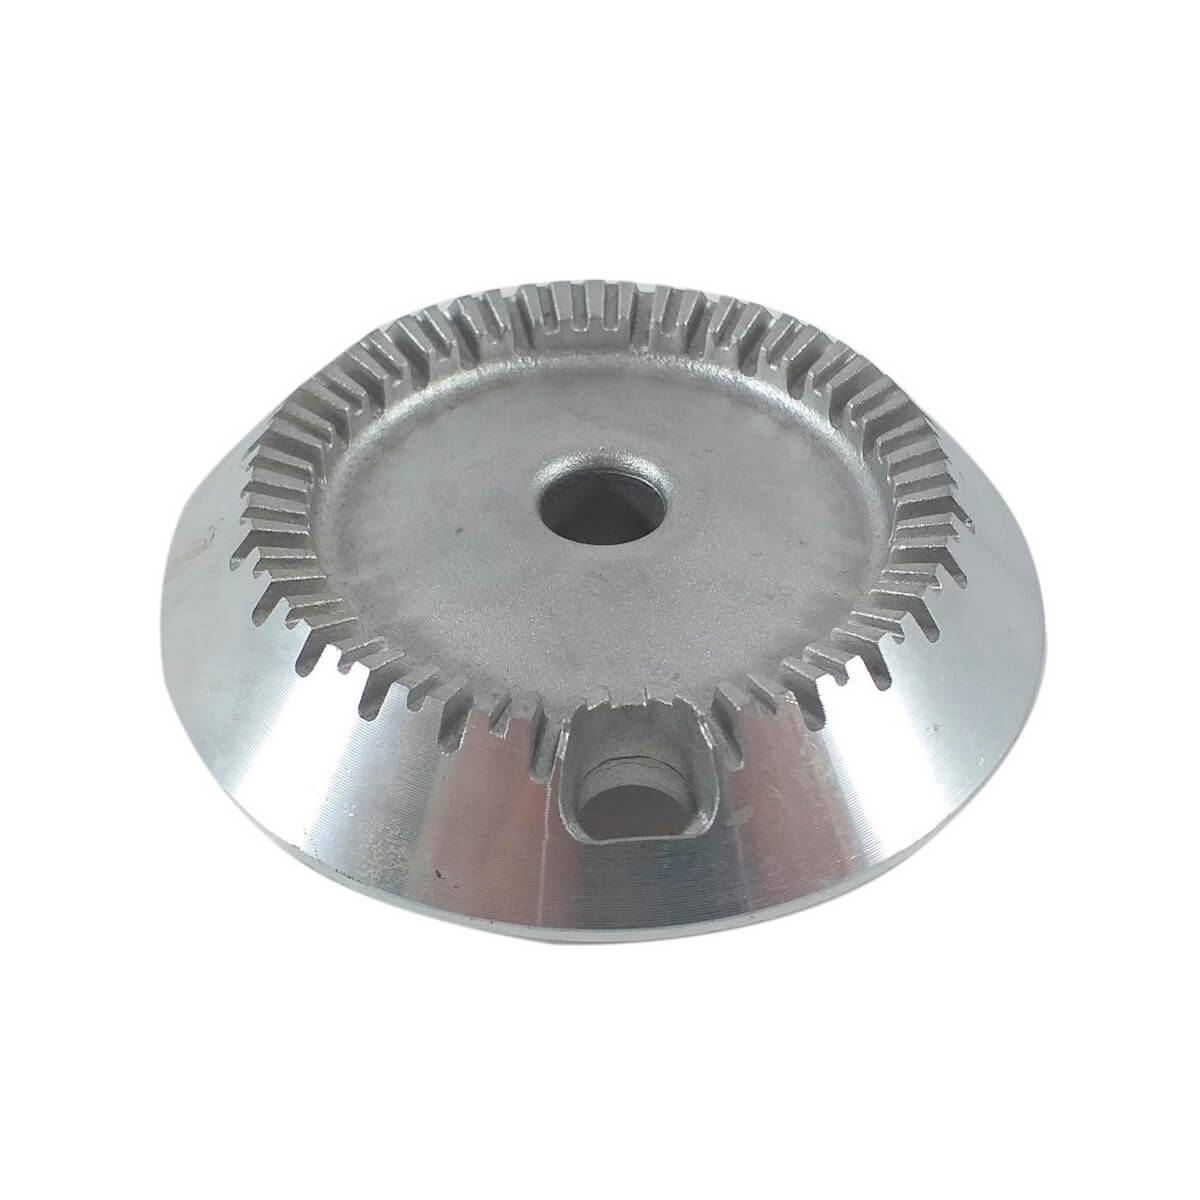 Coroa Queimador Semi-rápido Para fogão Electrolux 56DB 56SPB 56SX - 62546039